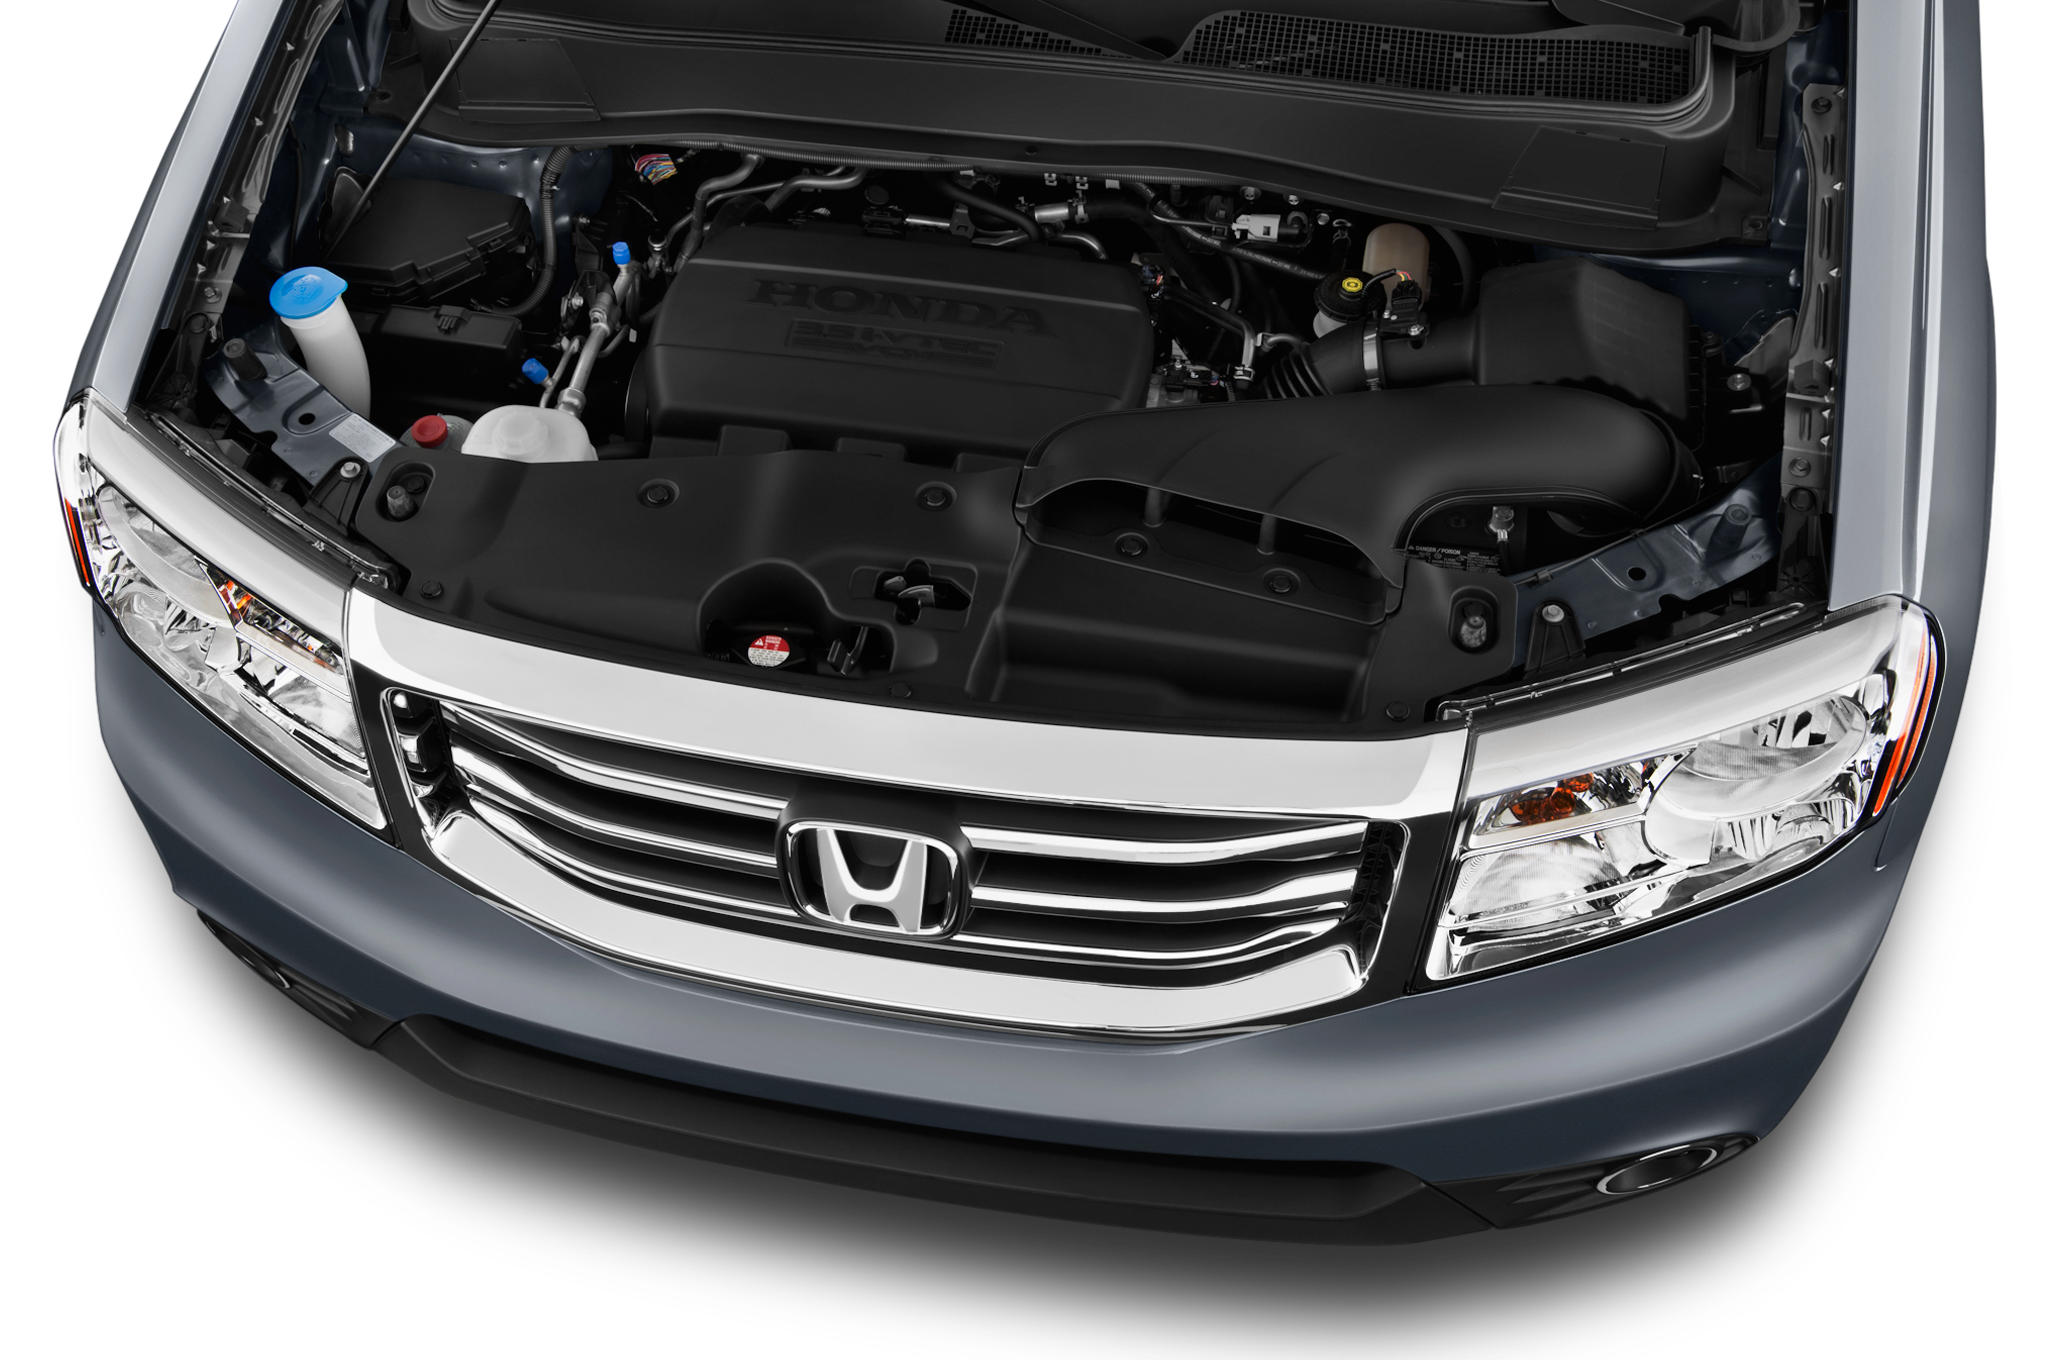 2012 Honda Pilot 4WD Touring - Editors' Notebook - Automobile Magazine